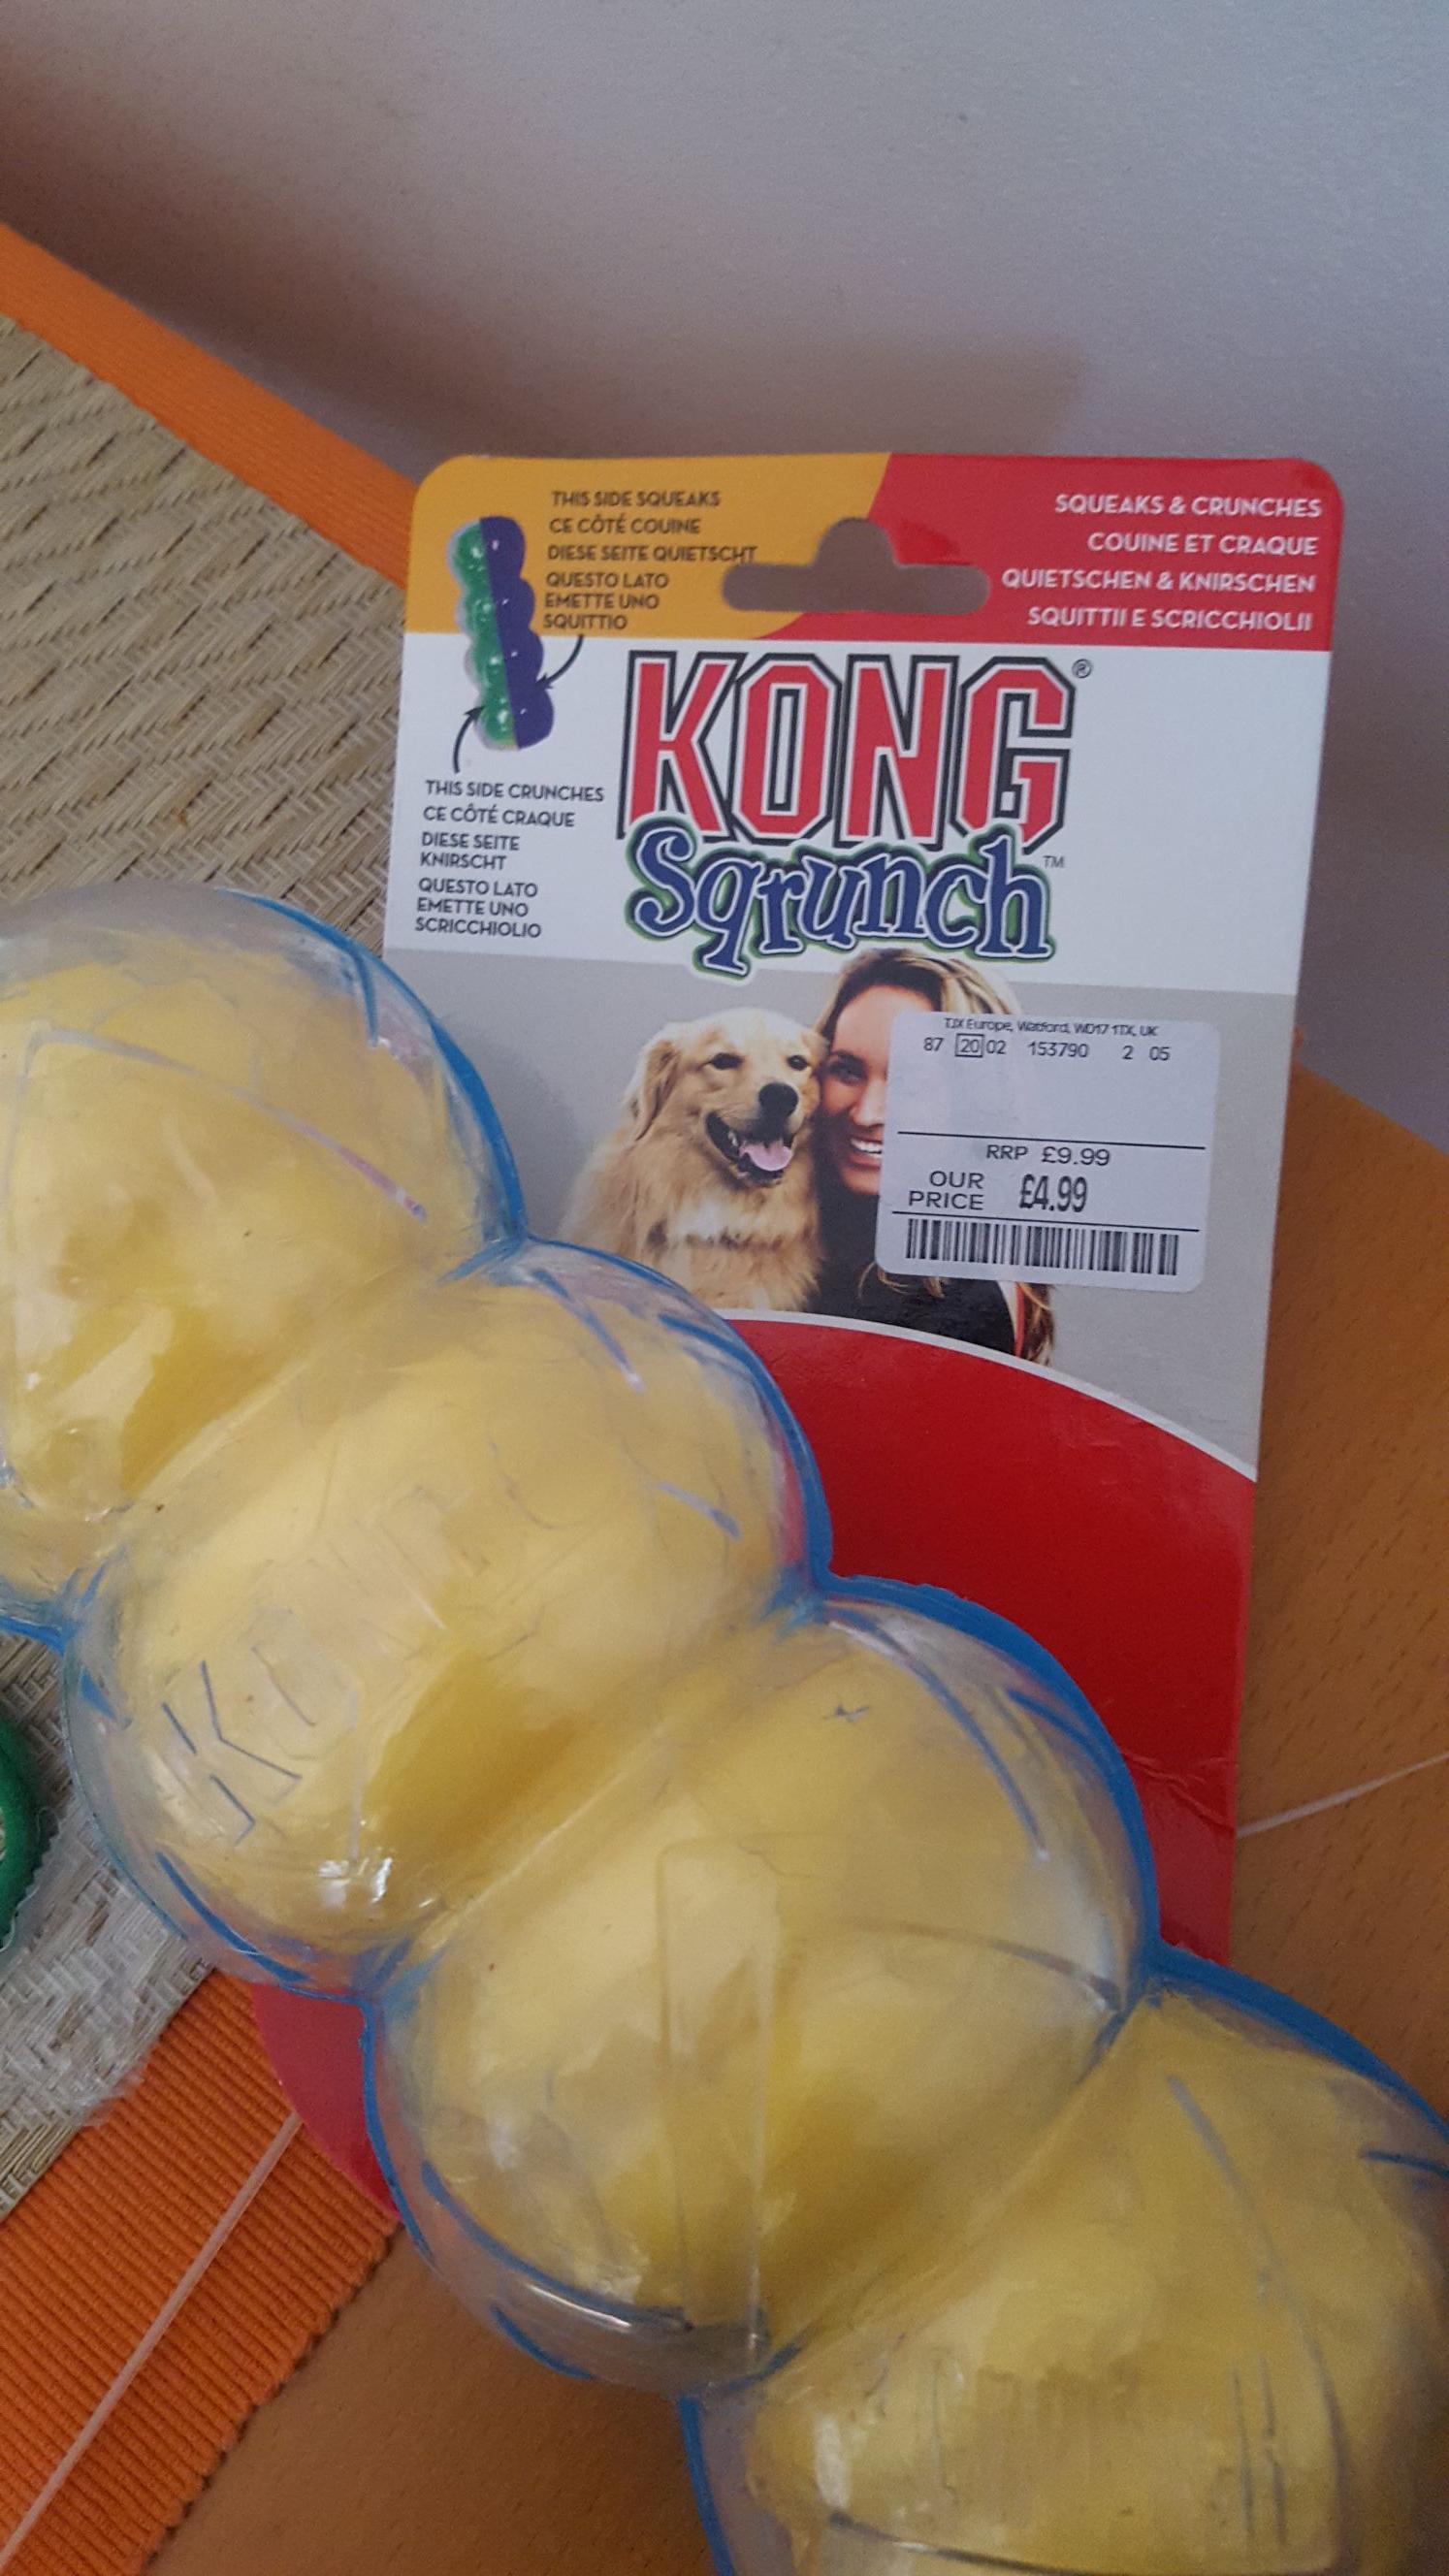 Large Kong Sqrunch dog toy £4.99 Homesense Manchester Arndale Centre